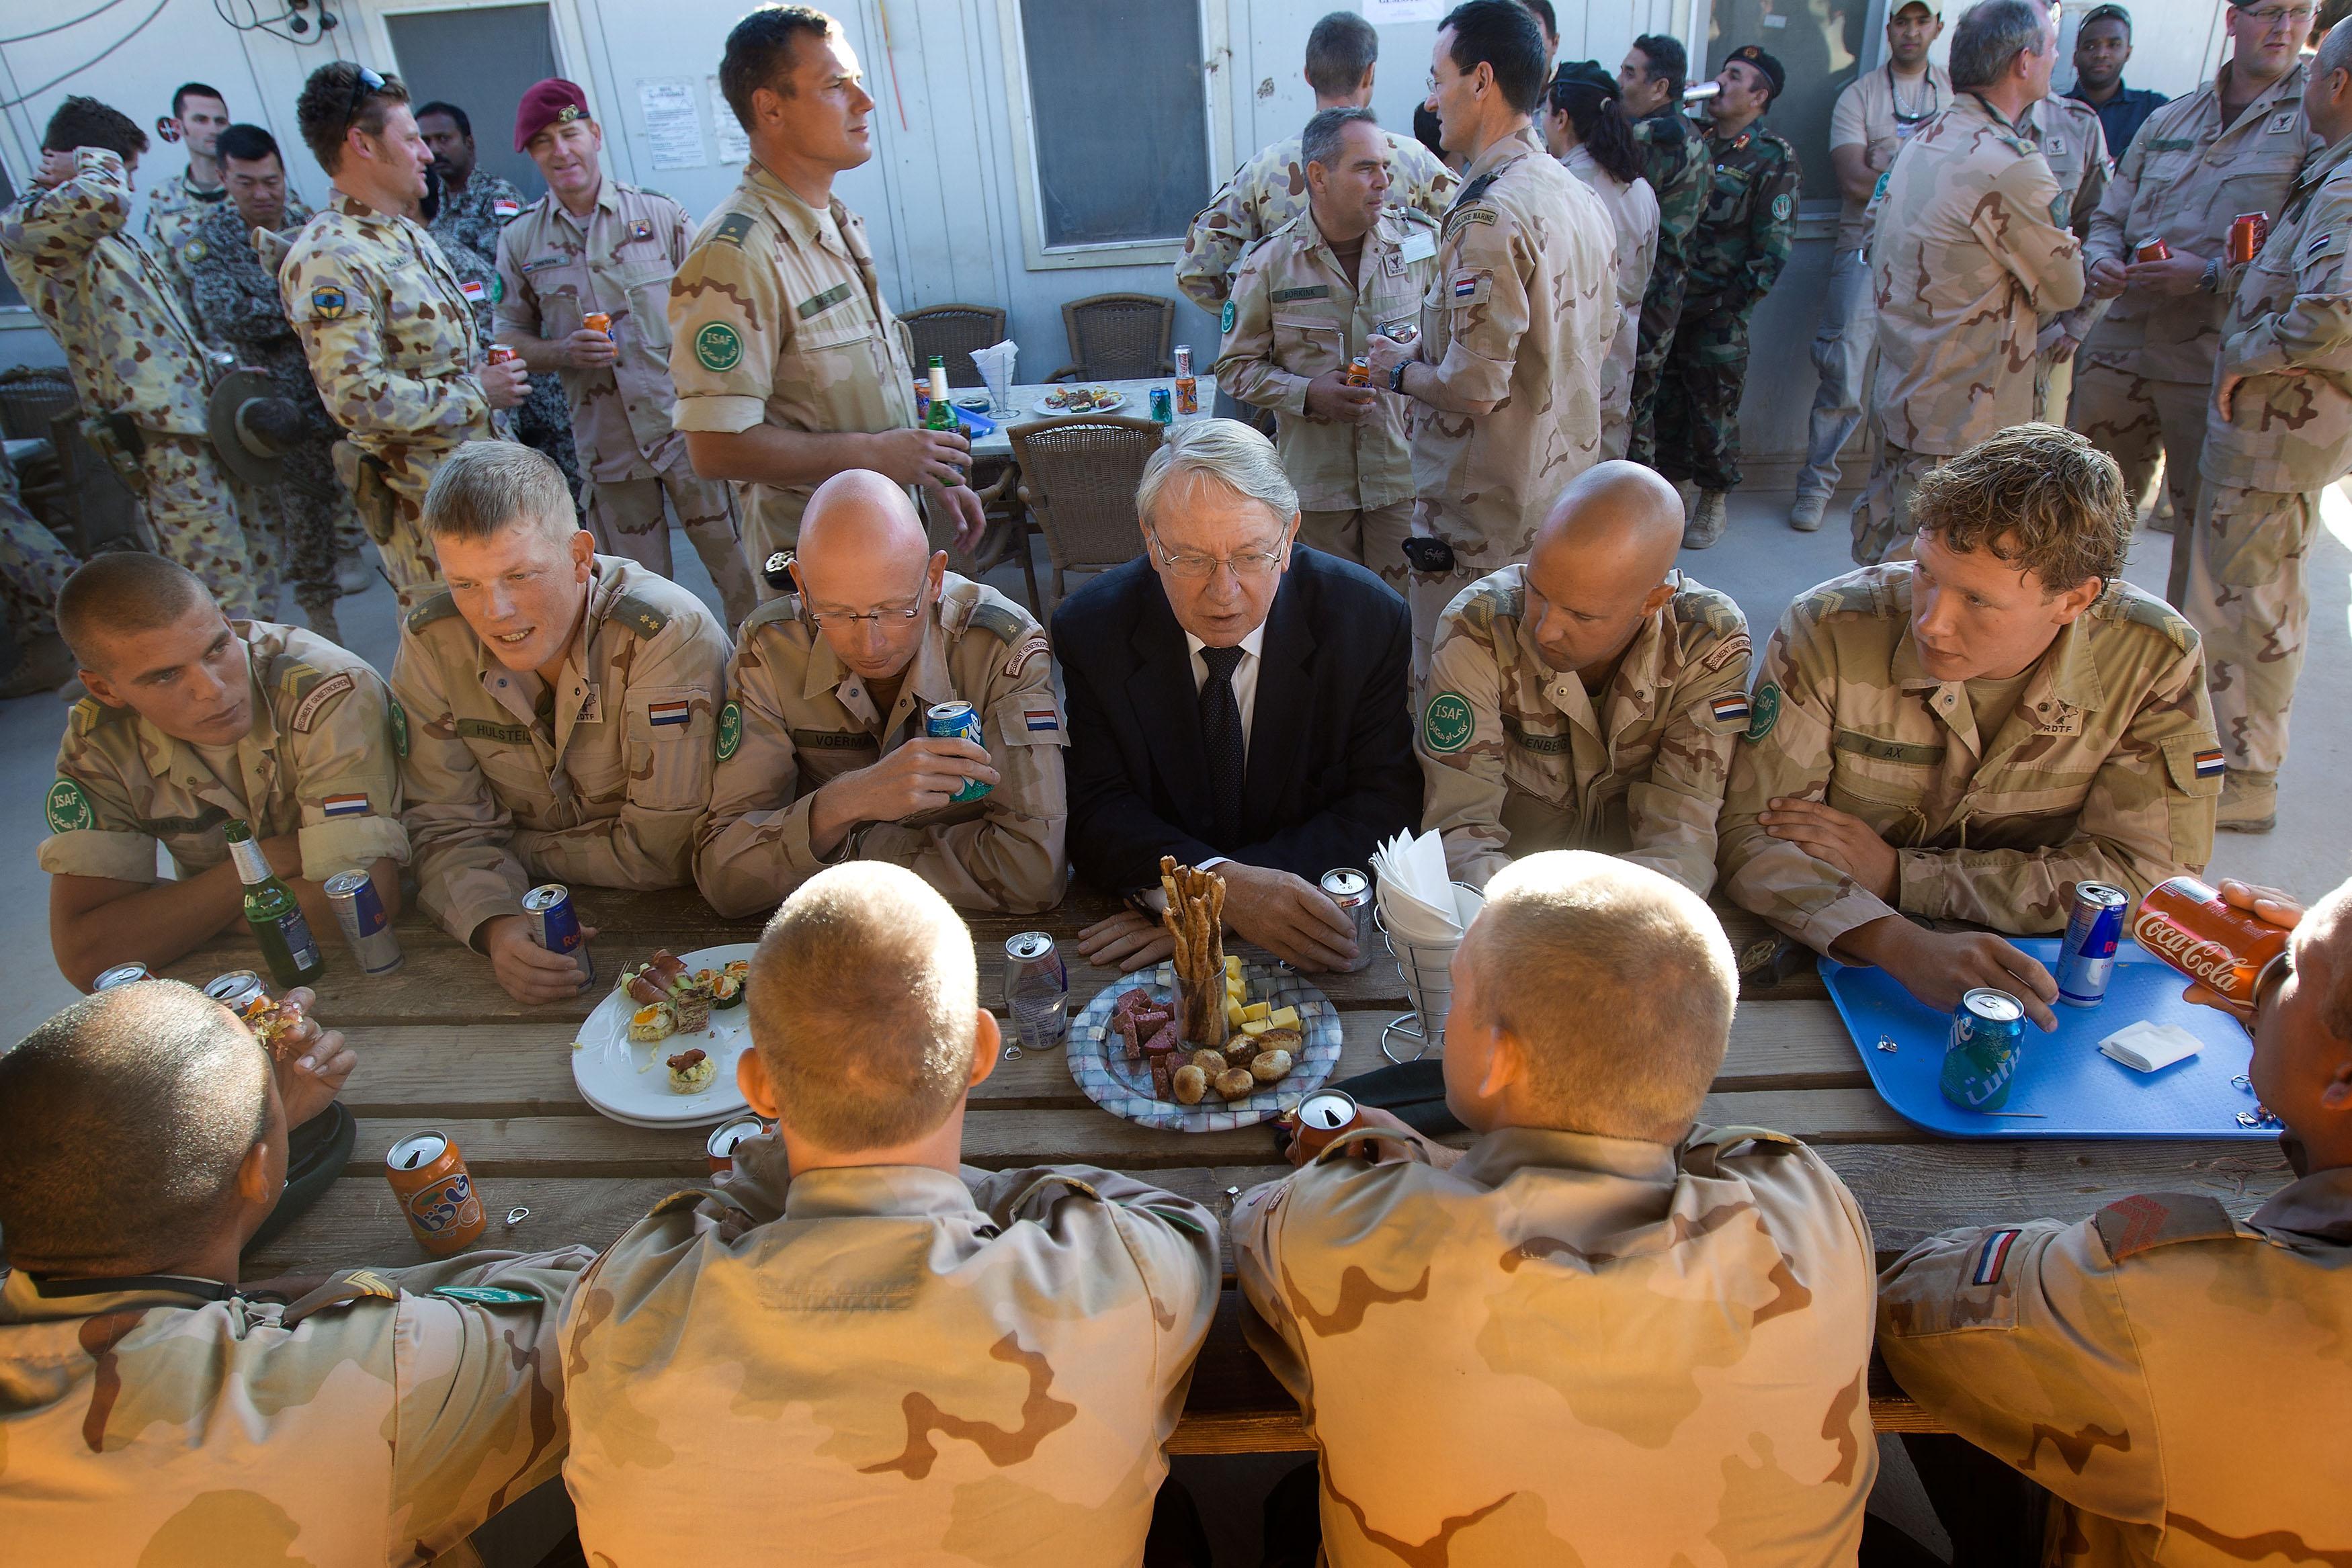 Afghaanse tolken missie Uruzgan bedreigd en vermoord.